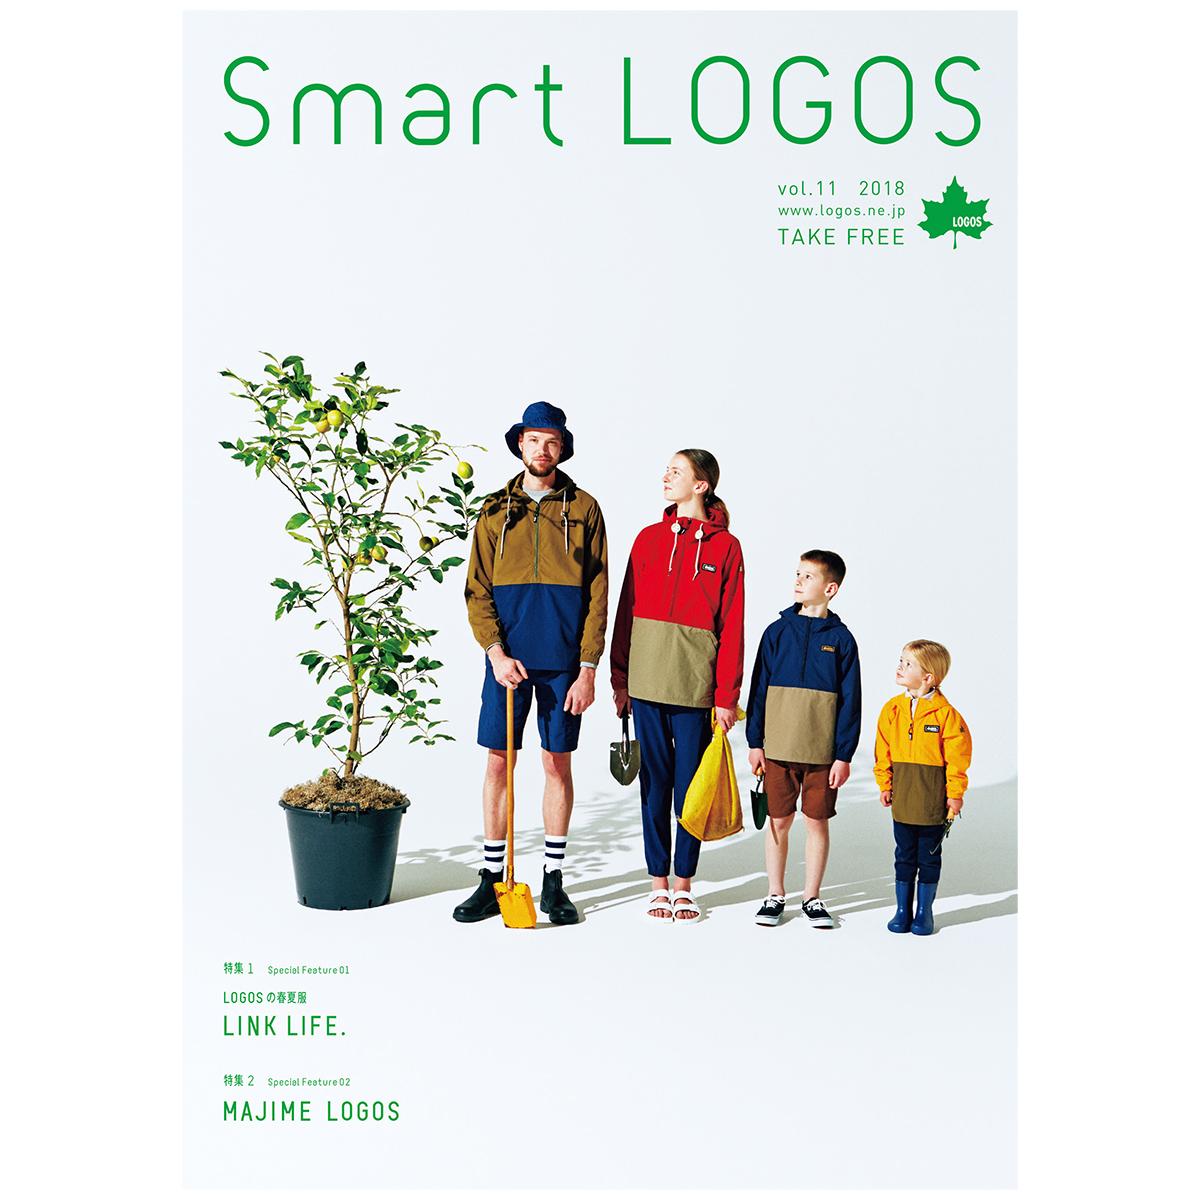 Smart LOGOS Vol.11